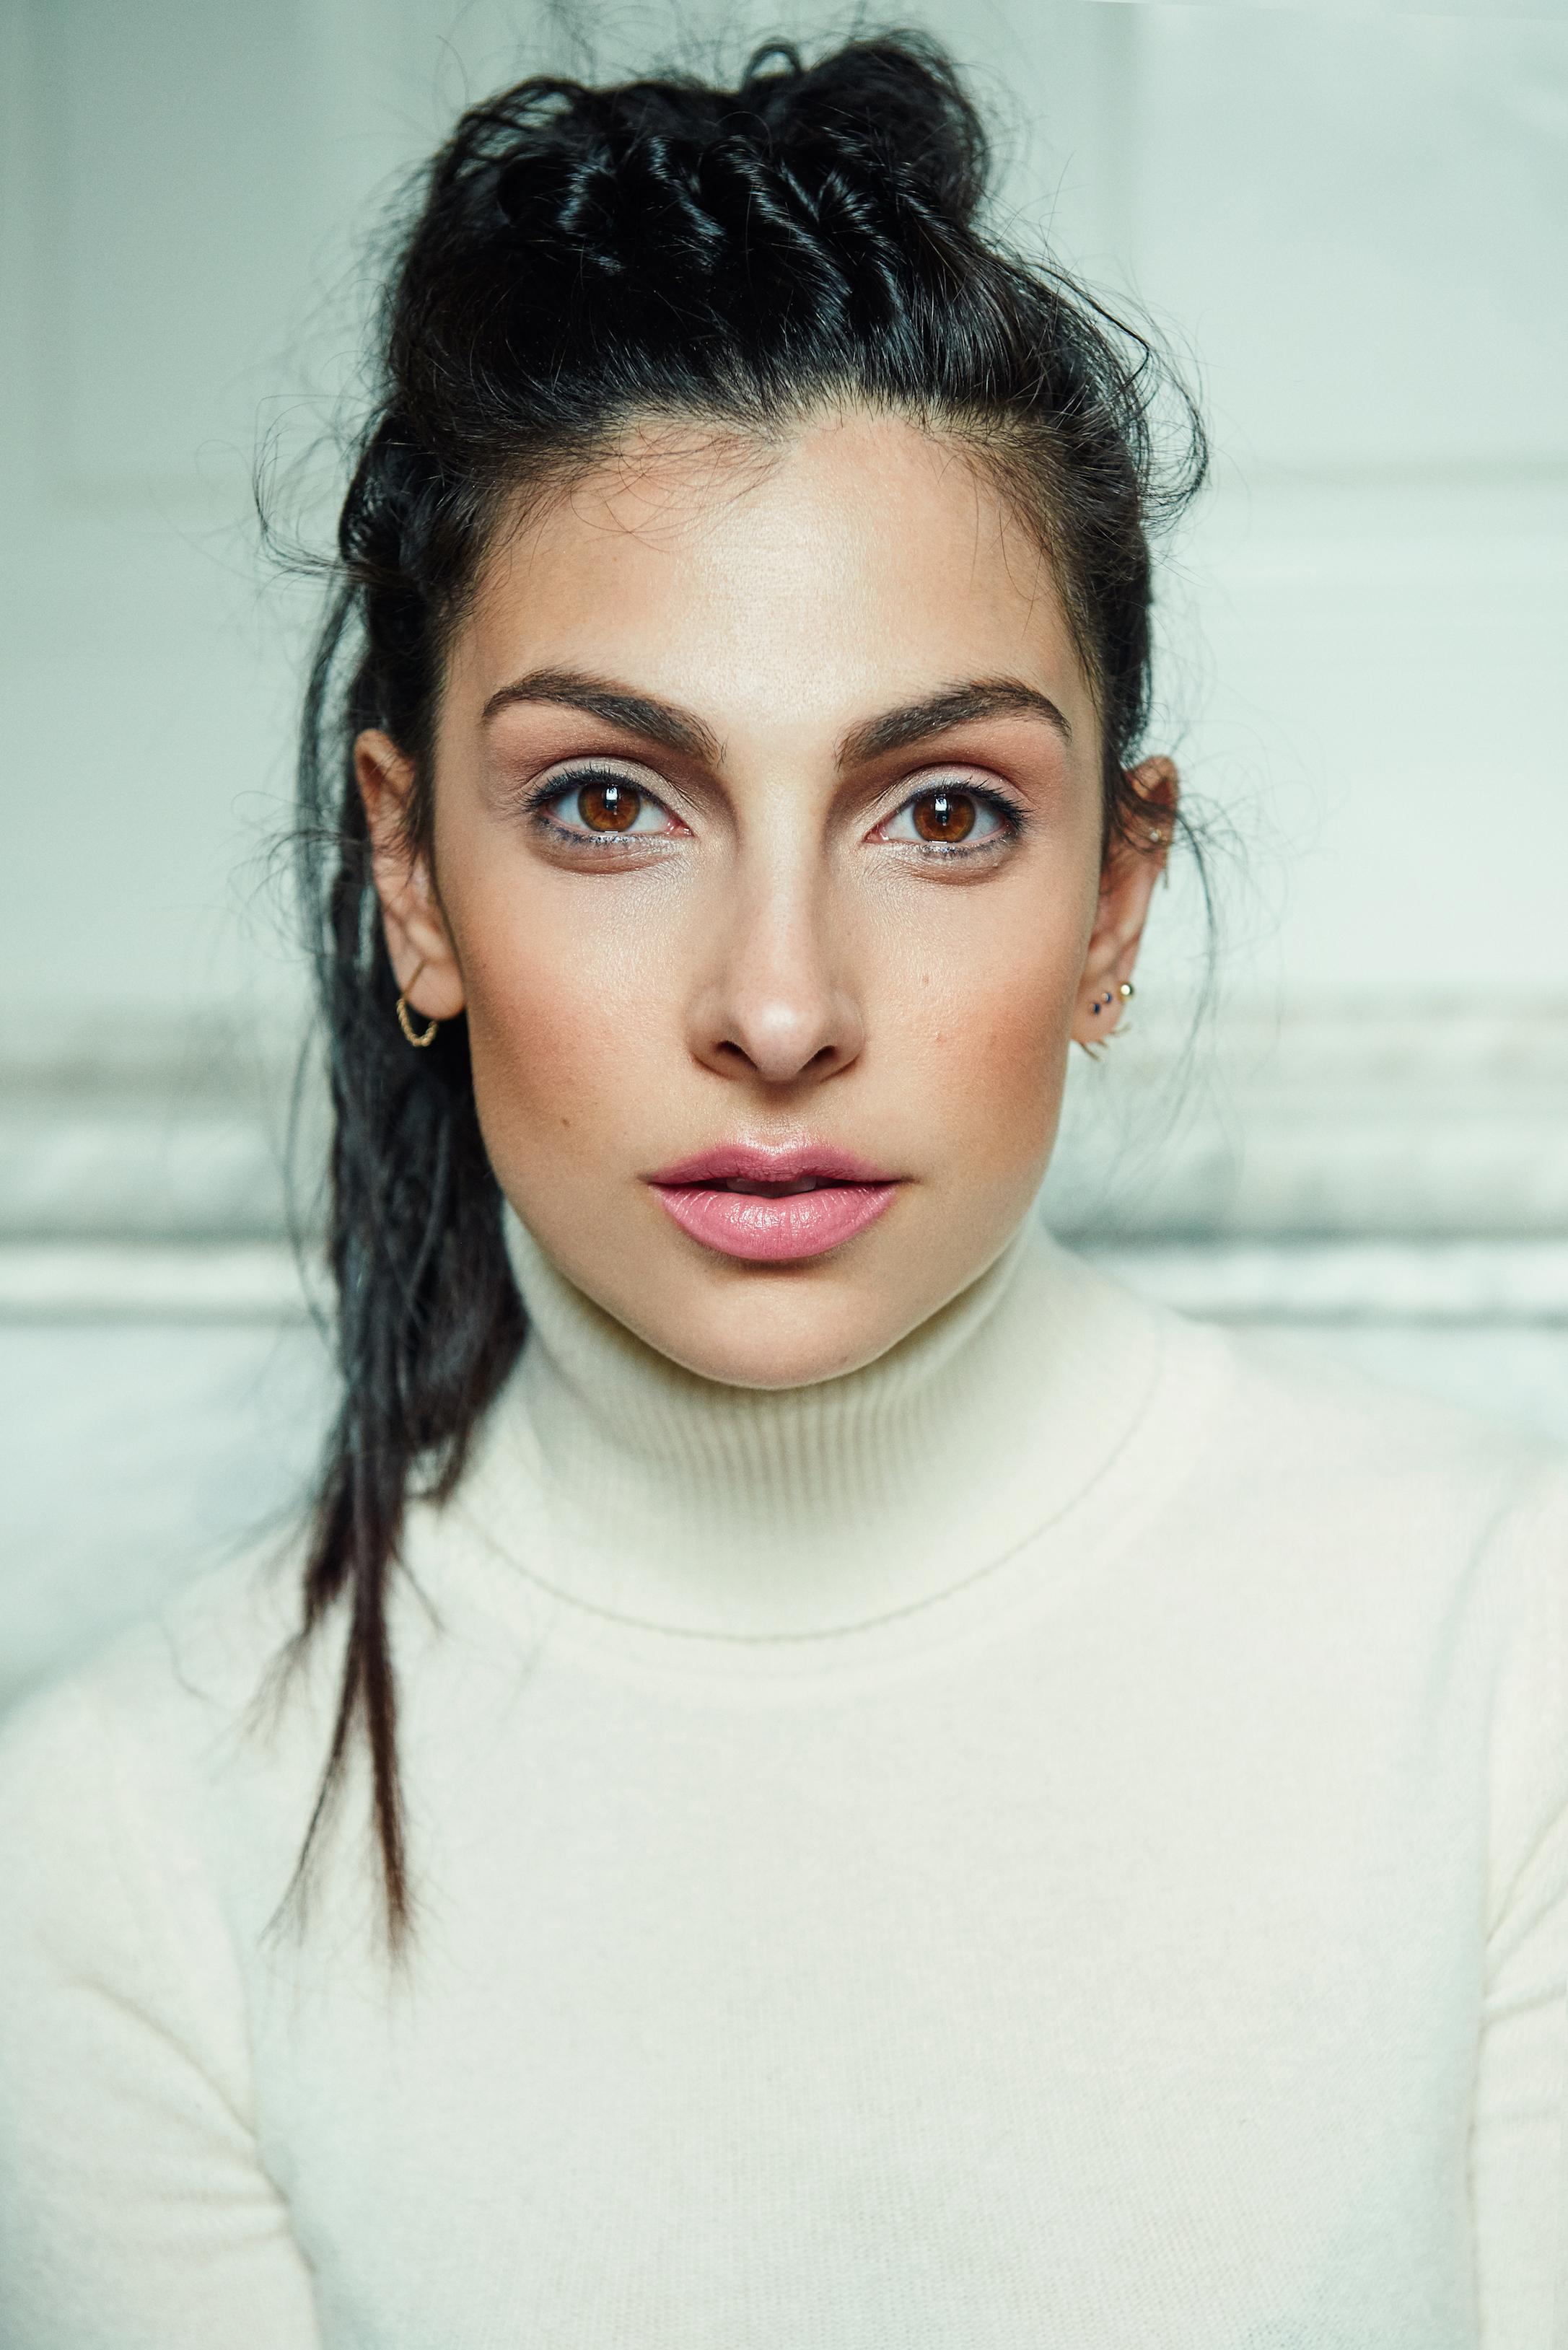 Mannen én Anna Nooshin  in Holland's Next Topmodel